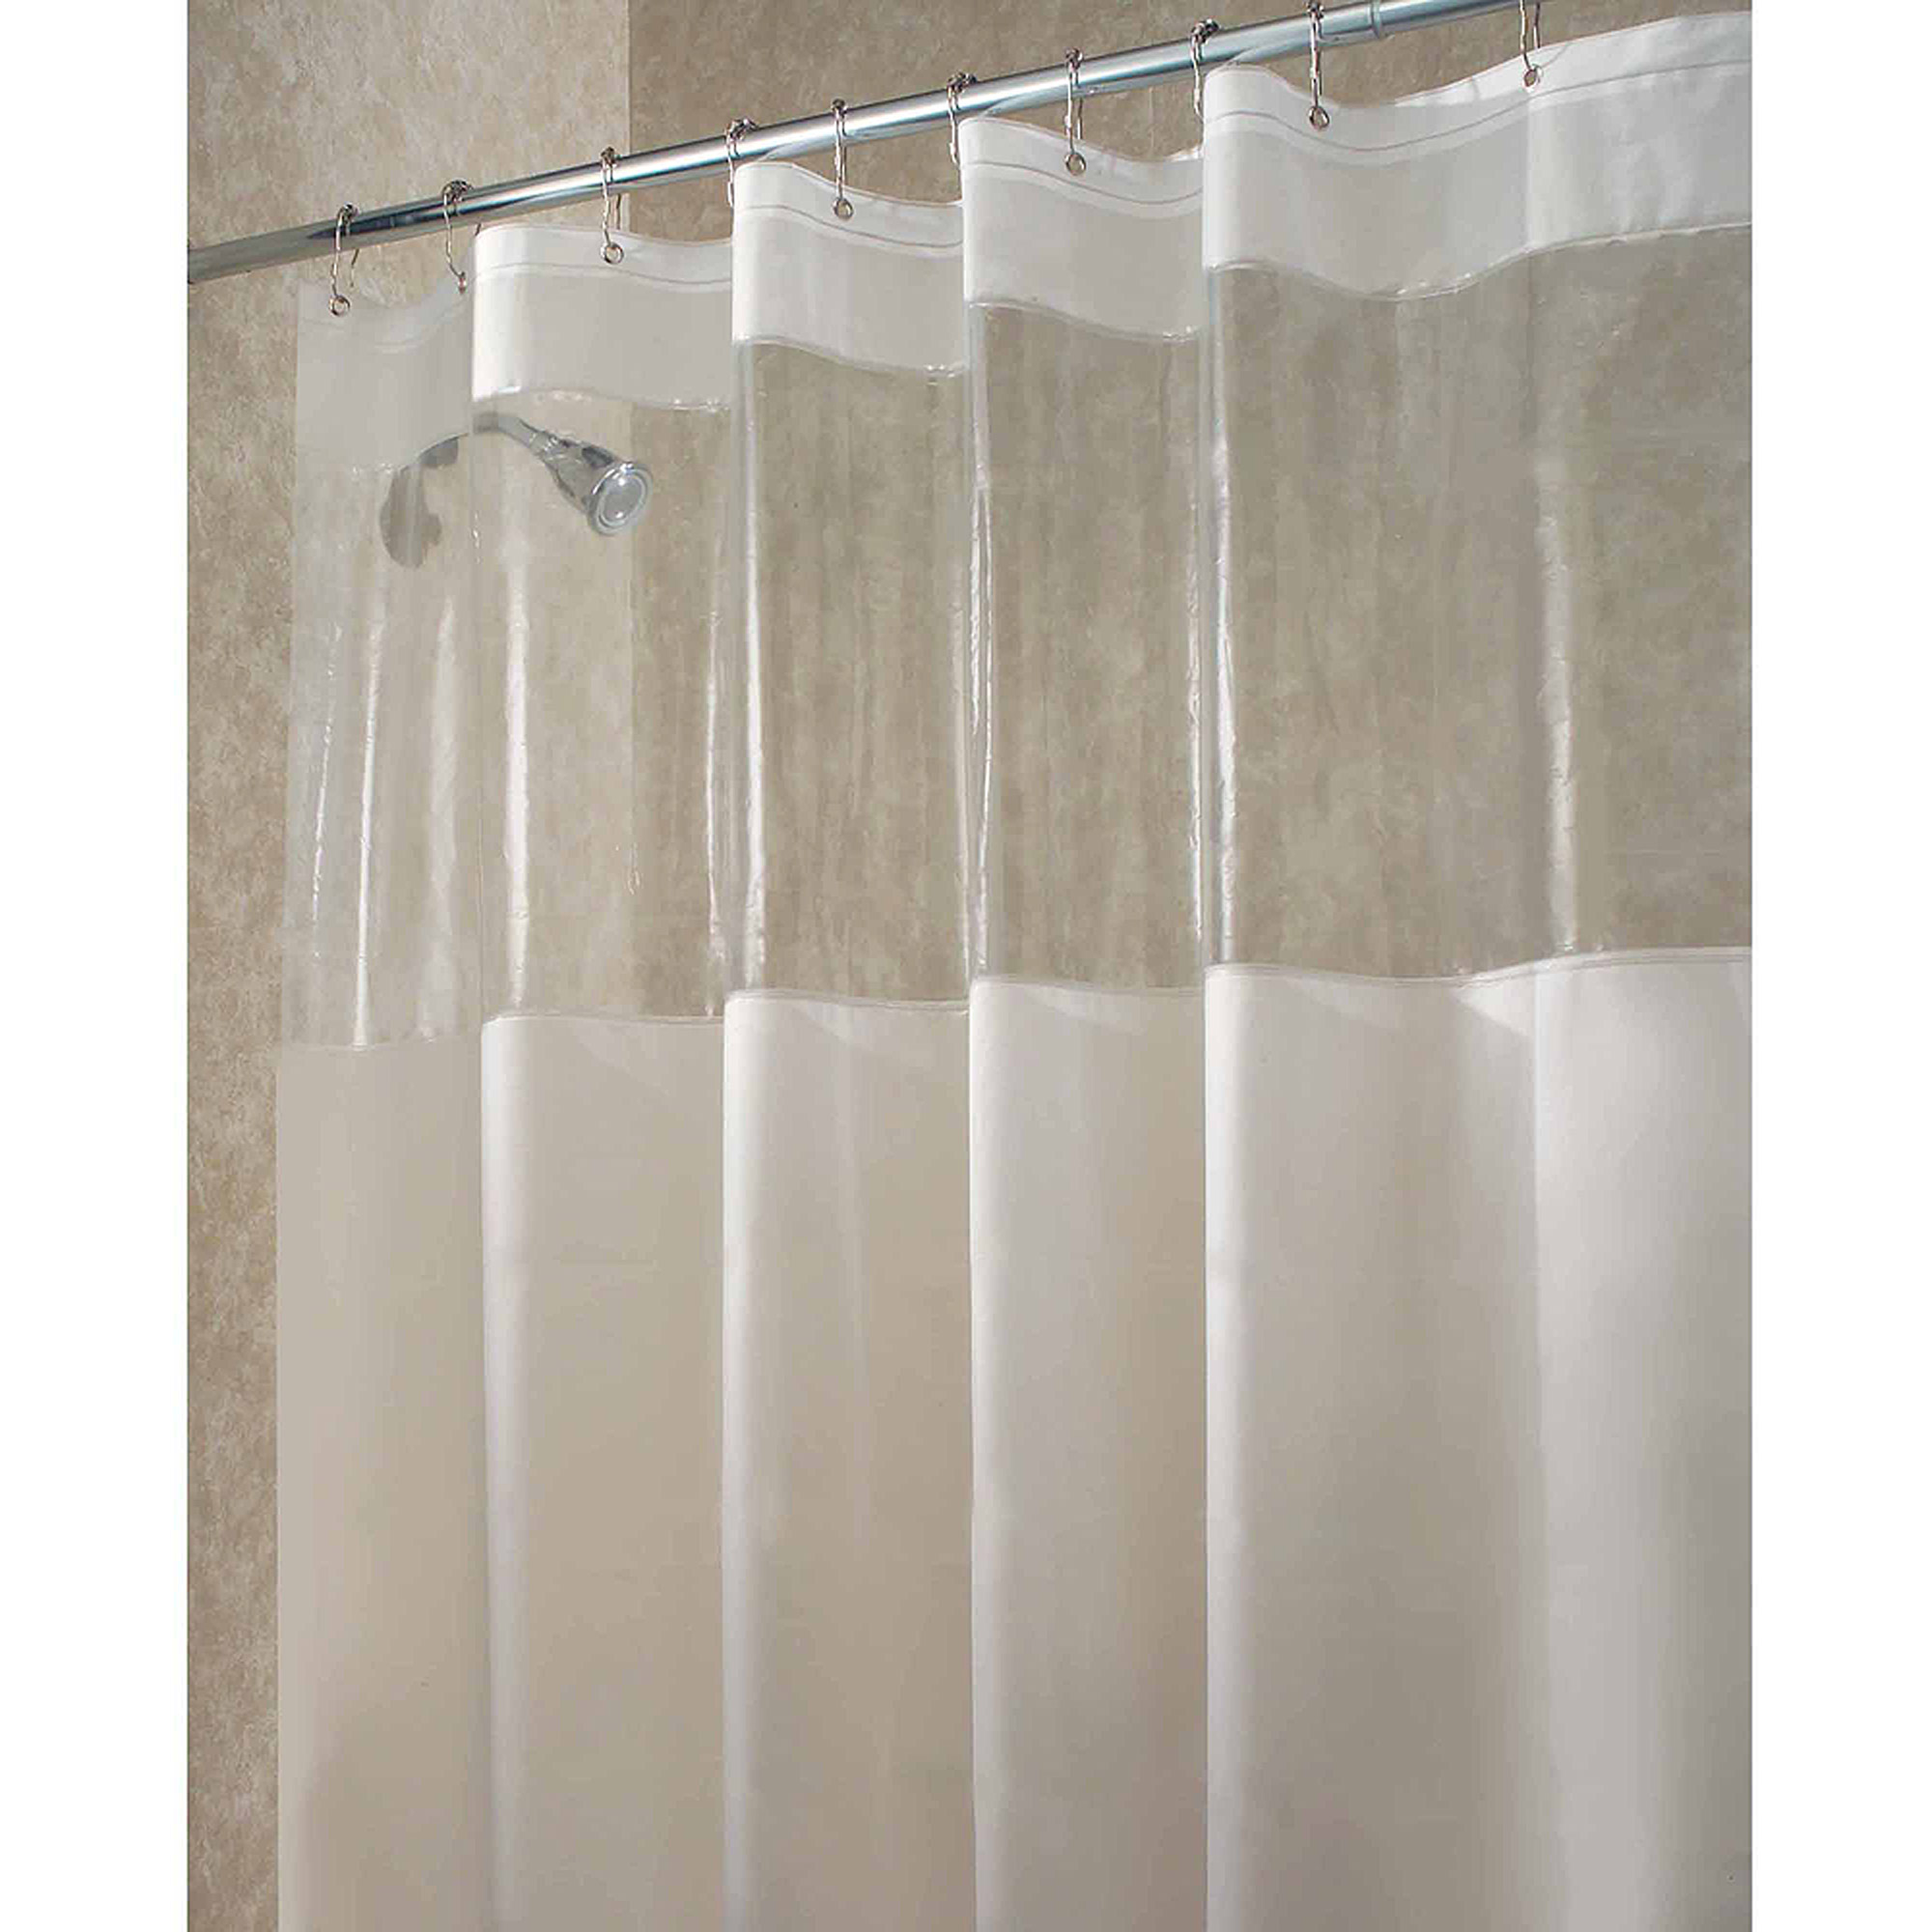 "InterDesign Hitchcock EVA Shower Curtain, Standard 72"" x 72"", Clear"